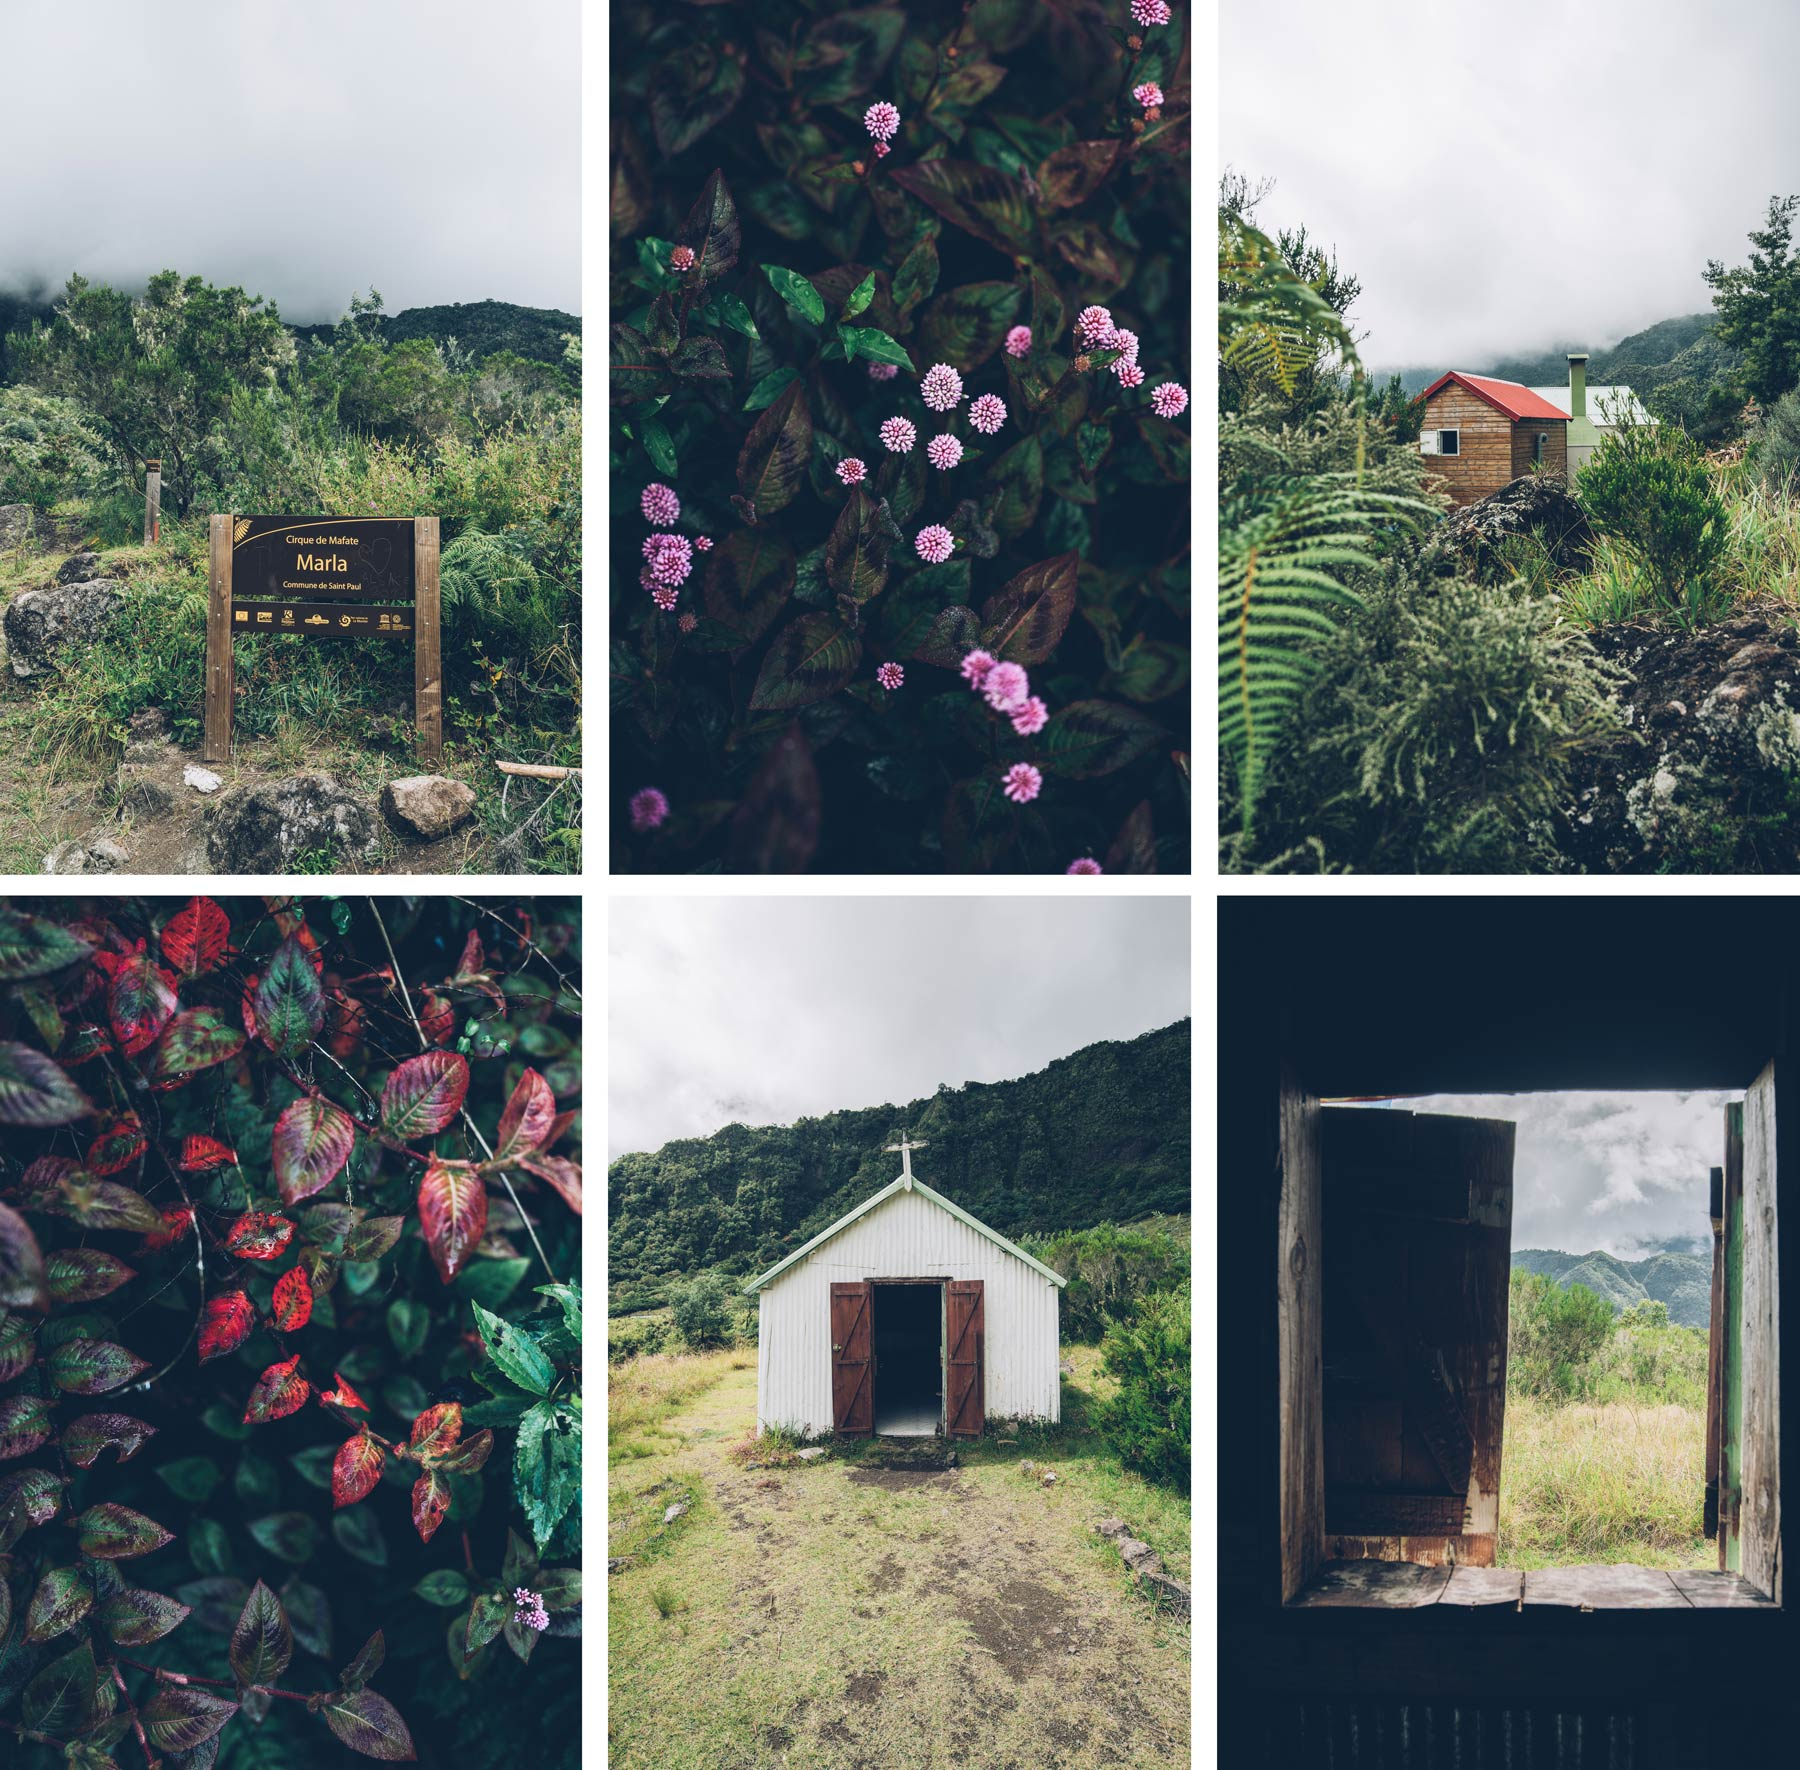 Marla, Mafate, Réunion